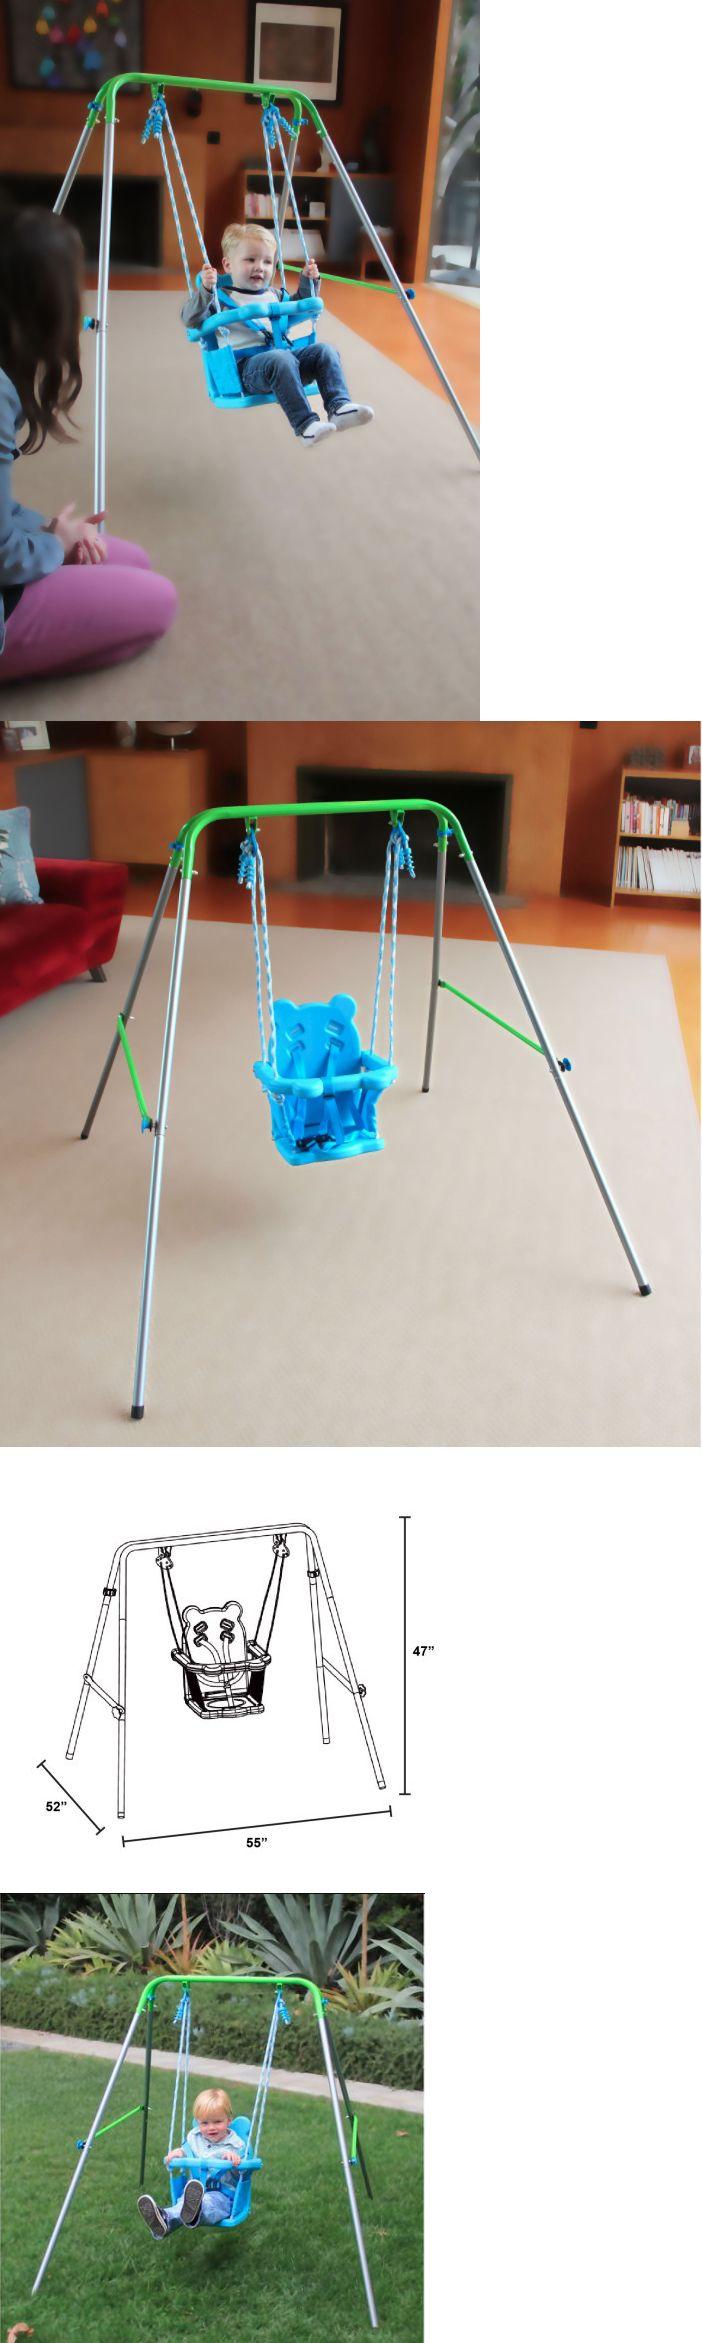 Baby Swings 2990: Baby Swing Chair Frame Reborn Summer Infant For ...